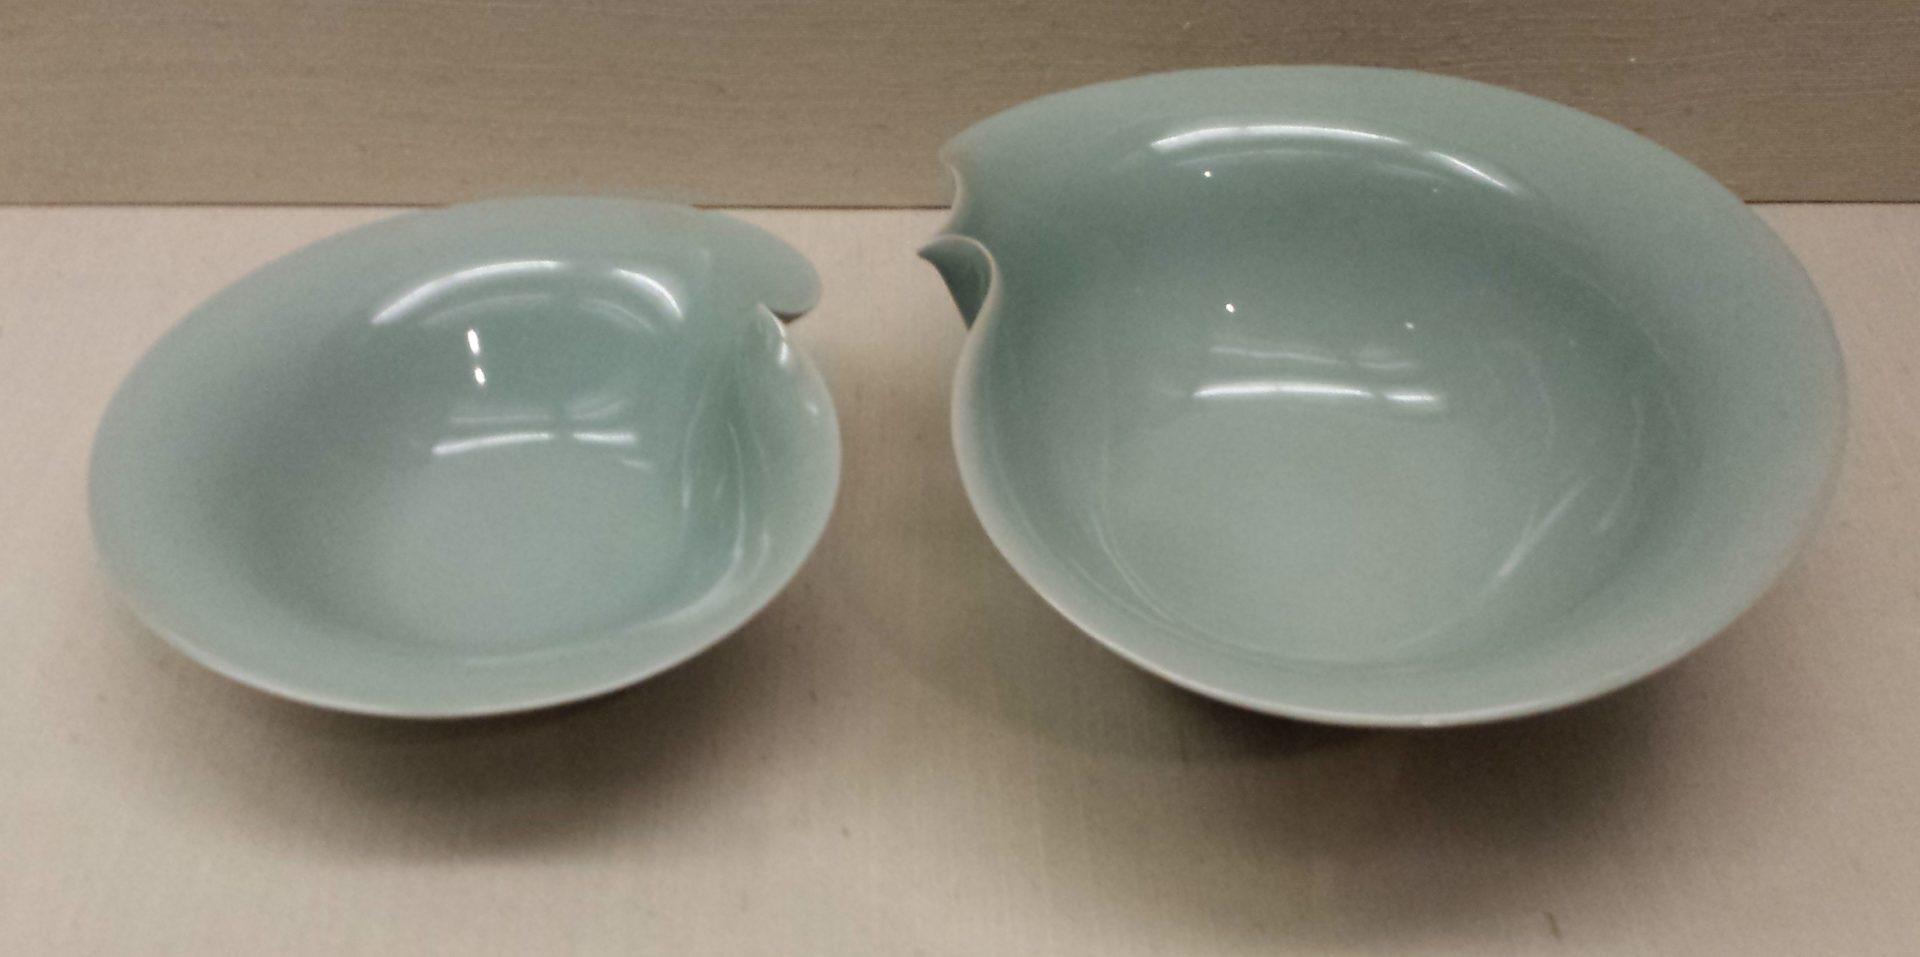 Great green bowls